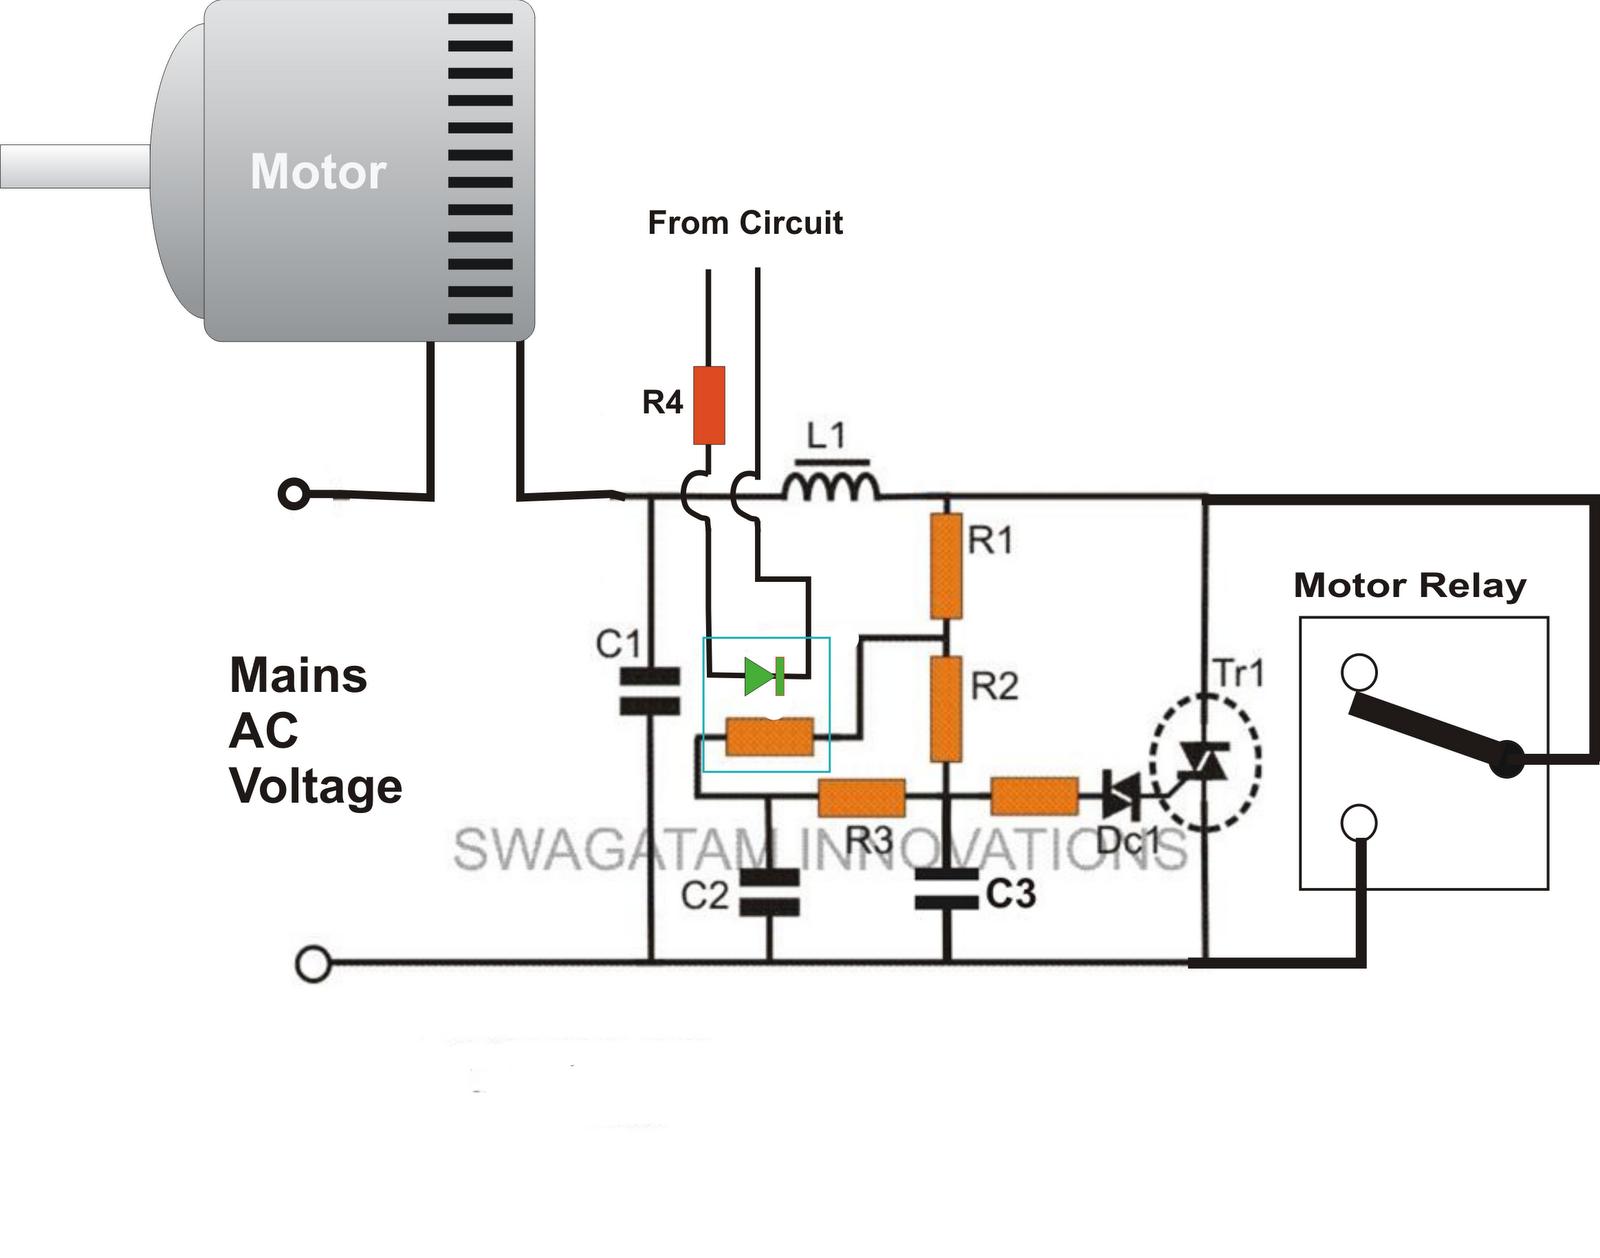 Wiring Diagram Of Motor Starter Ge Kilowatt Hour Meter Soft Start Get Free Image